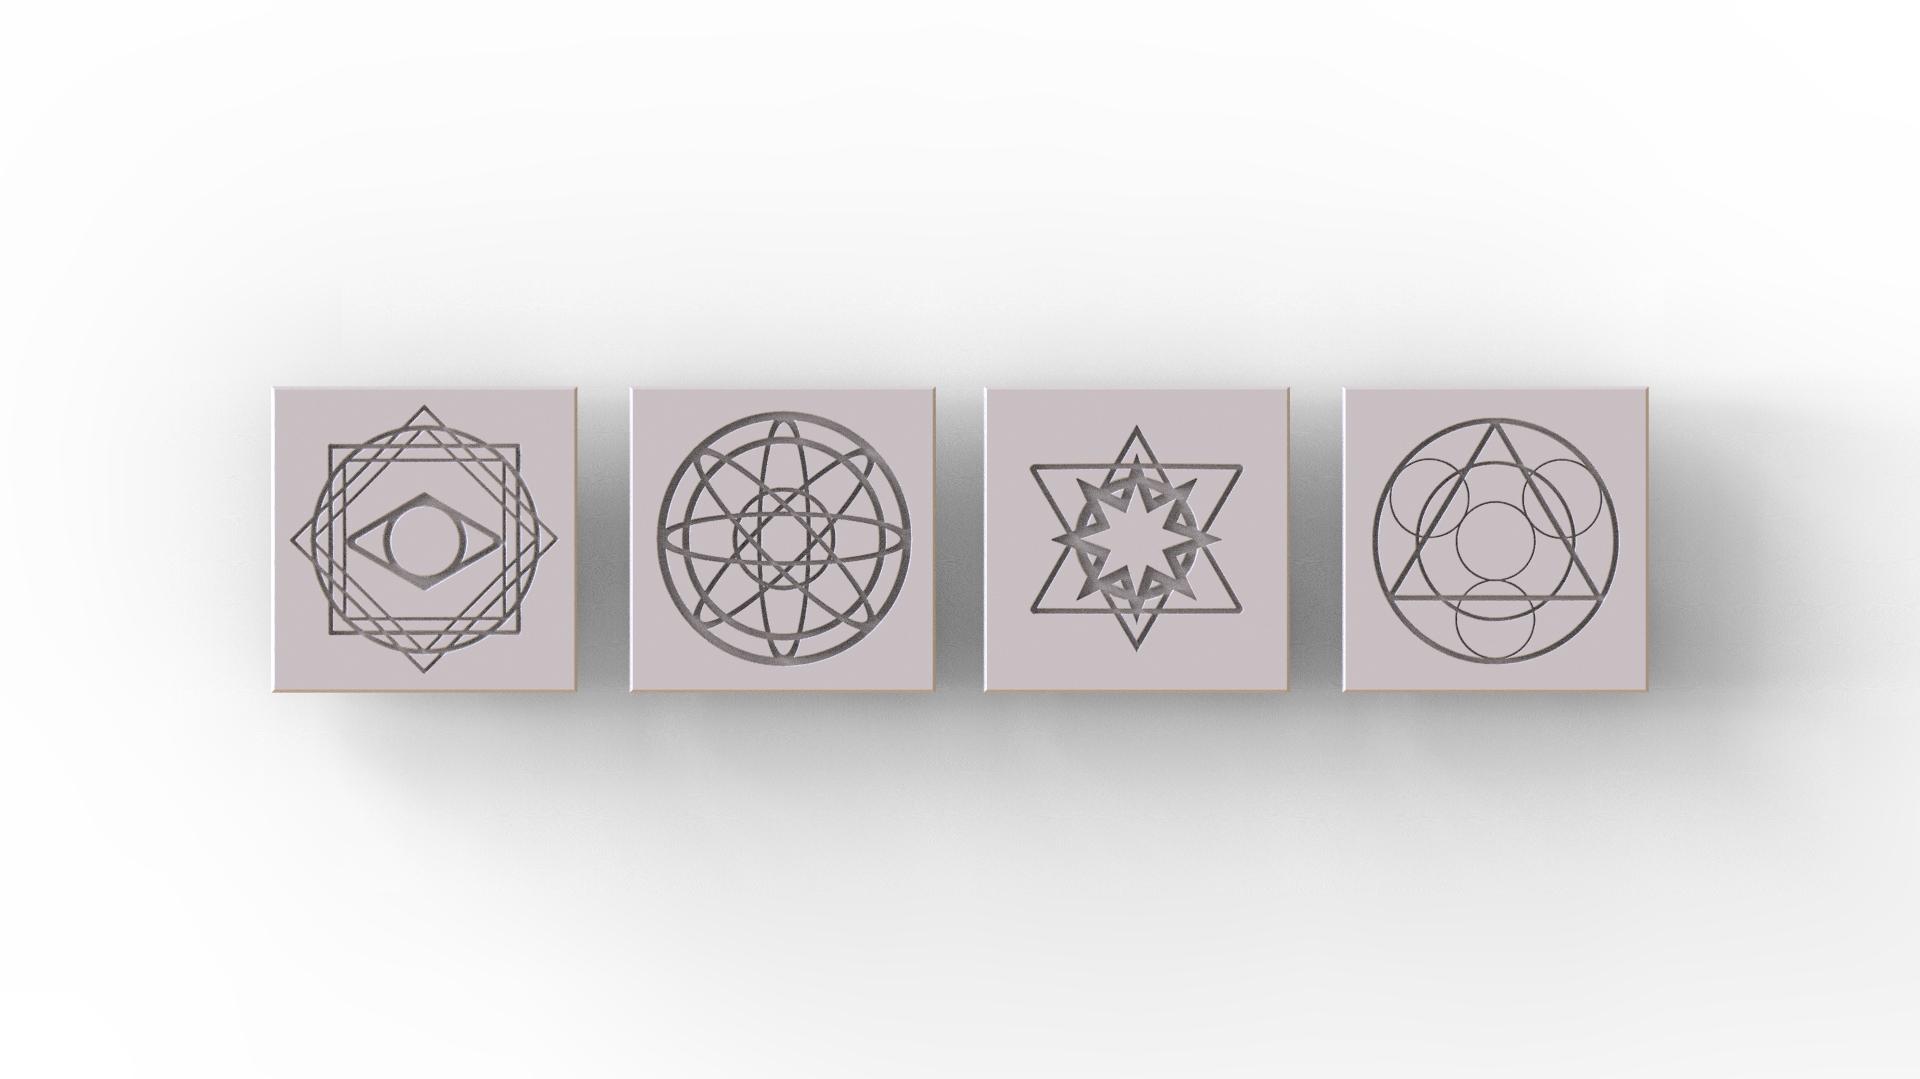 Magic_tiles.jpg